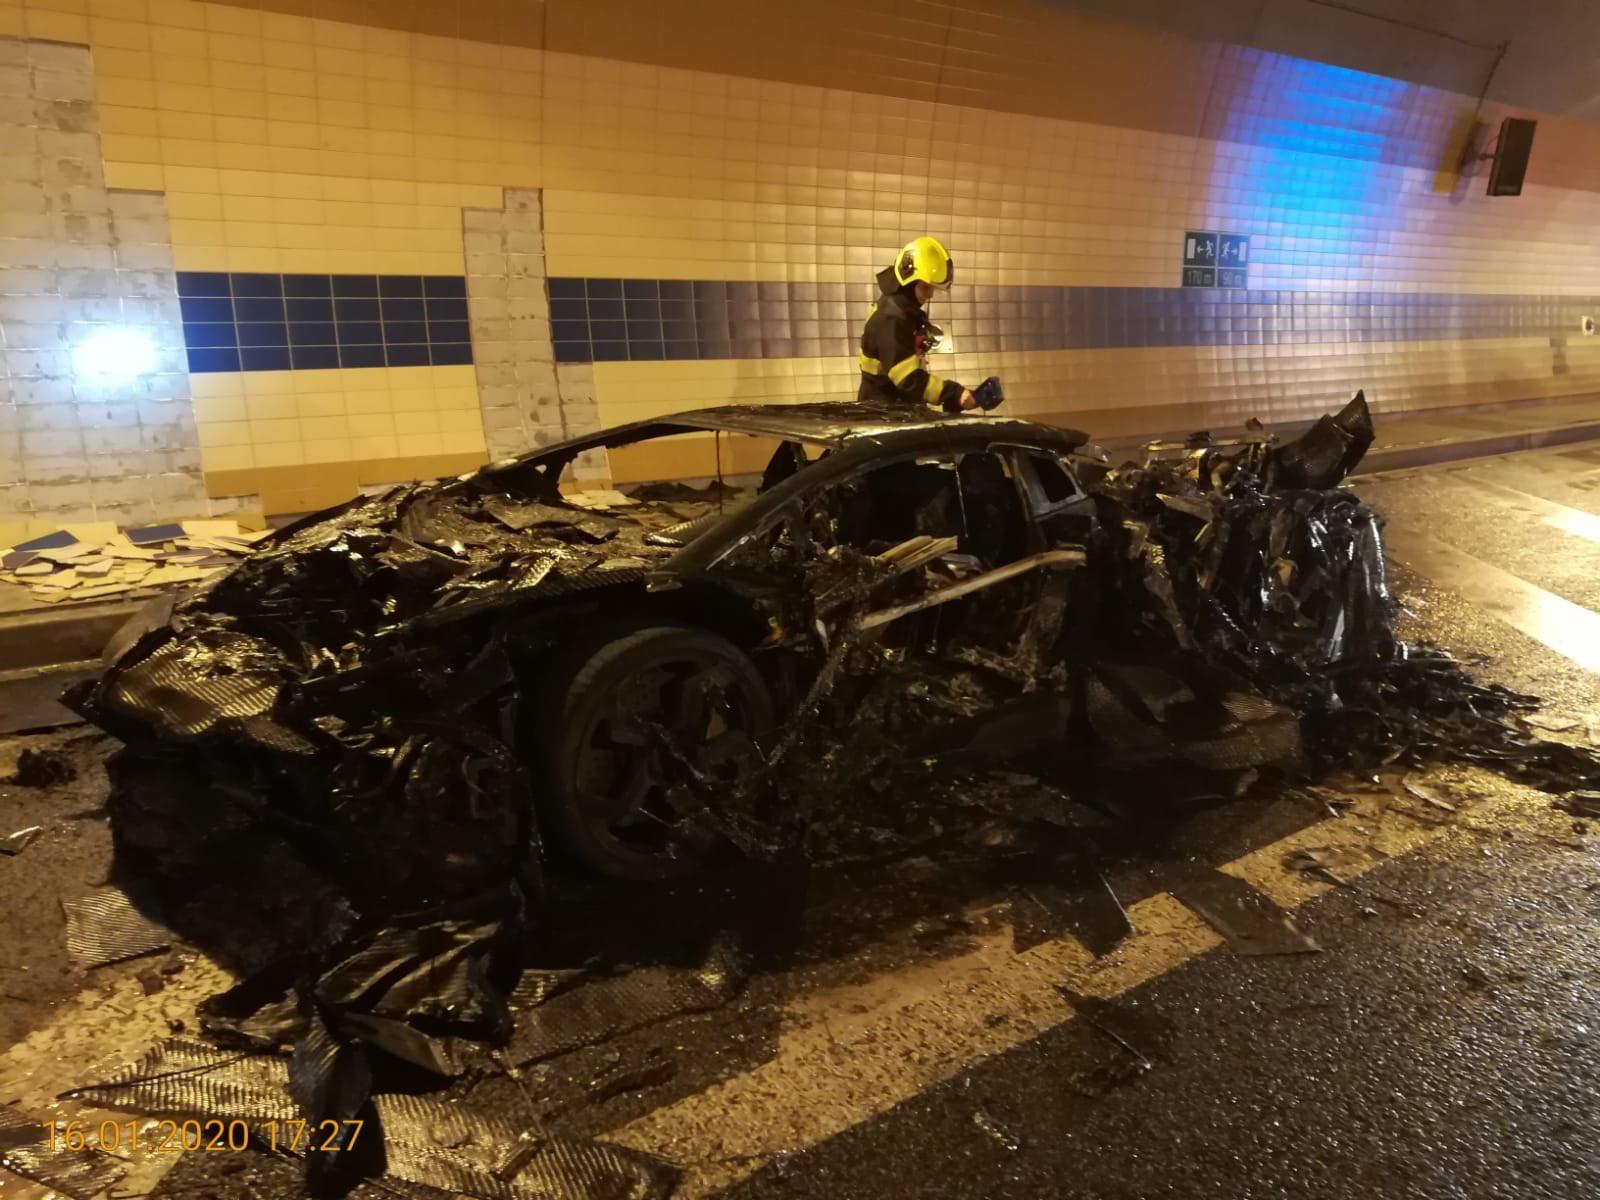 Lamborghini-Aventador-Carbonado-burned-5